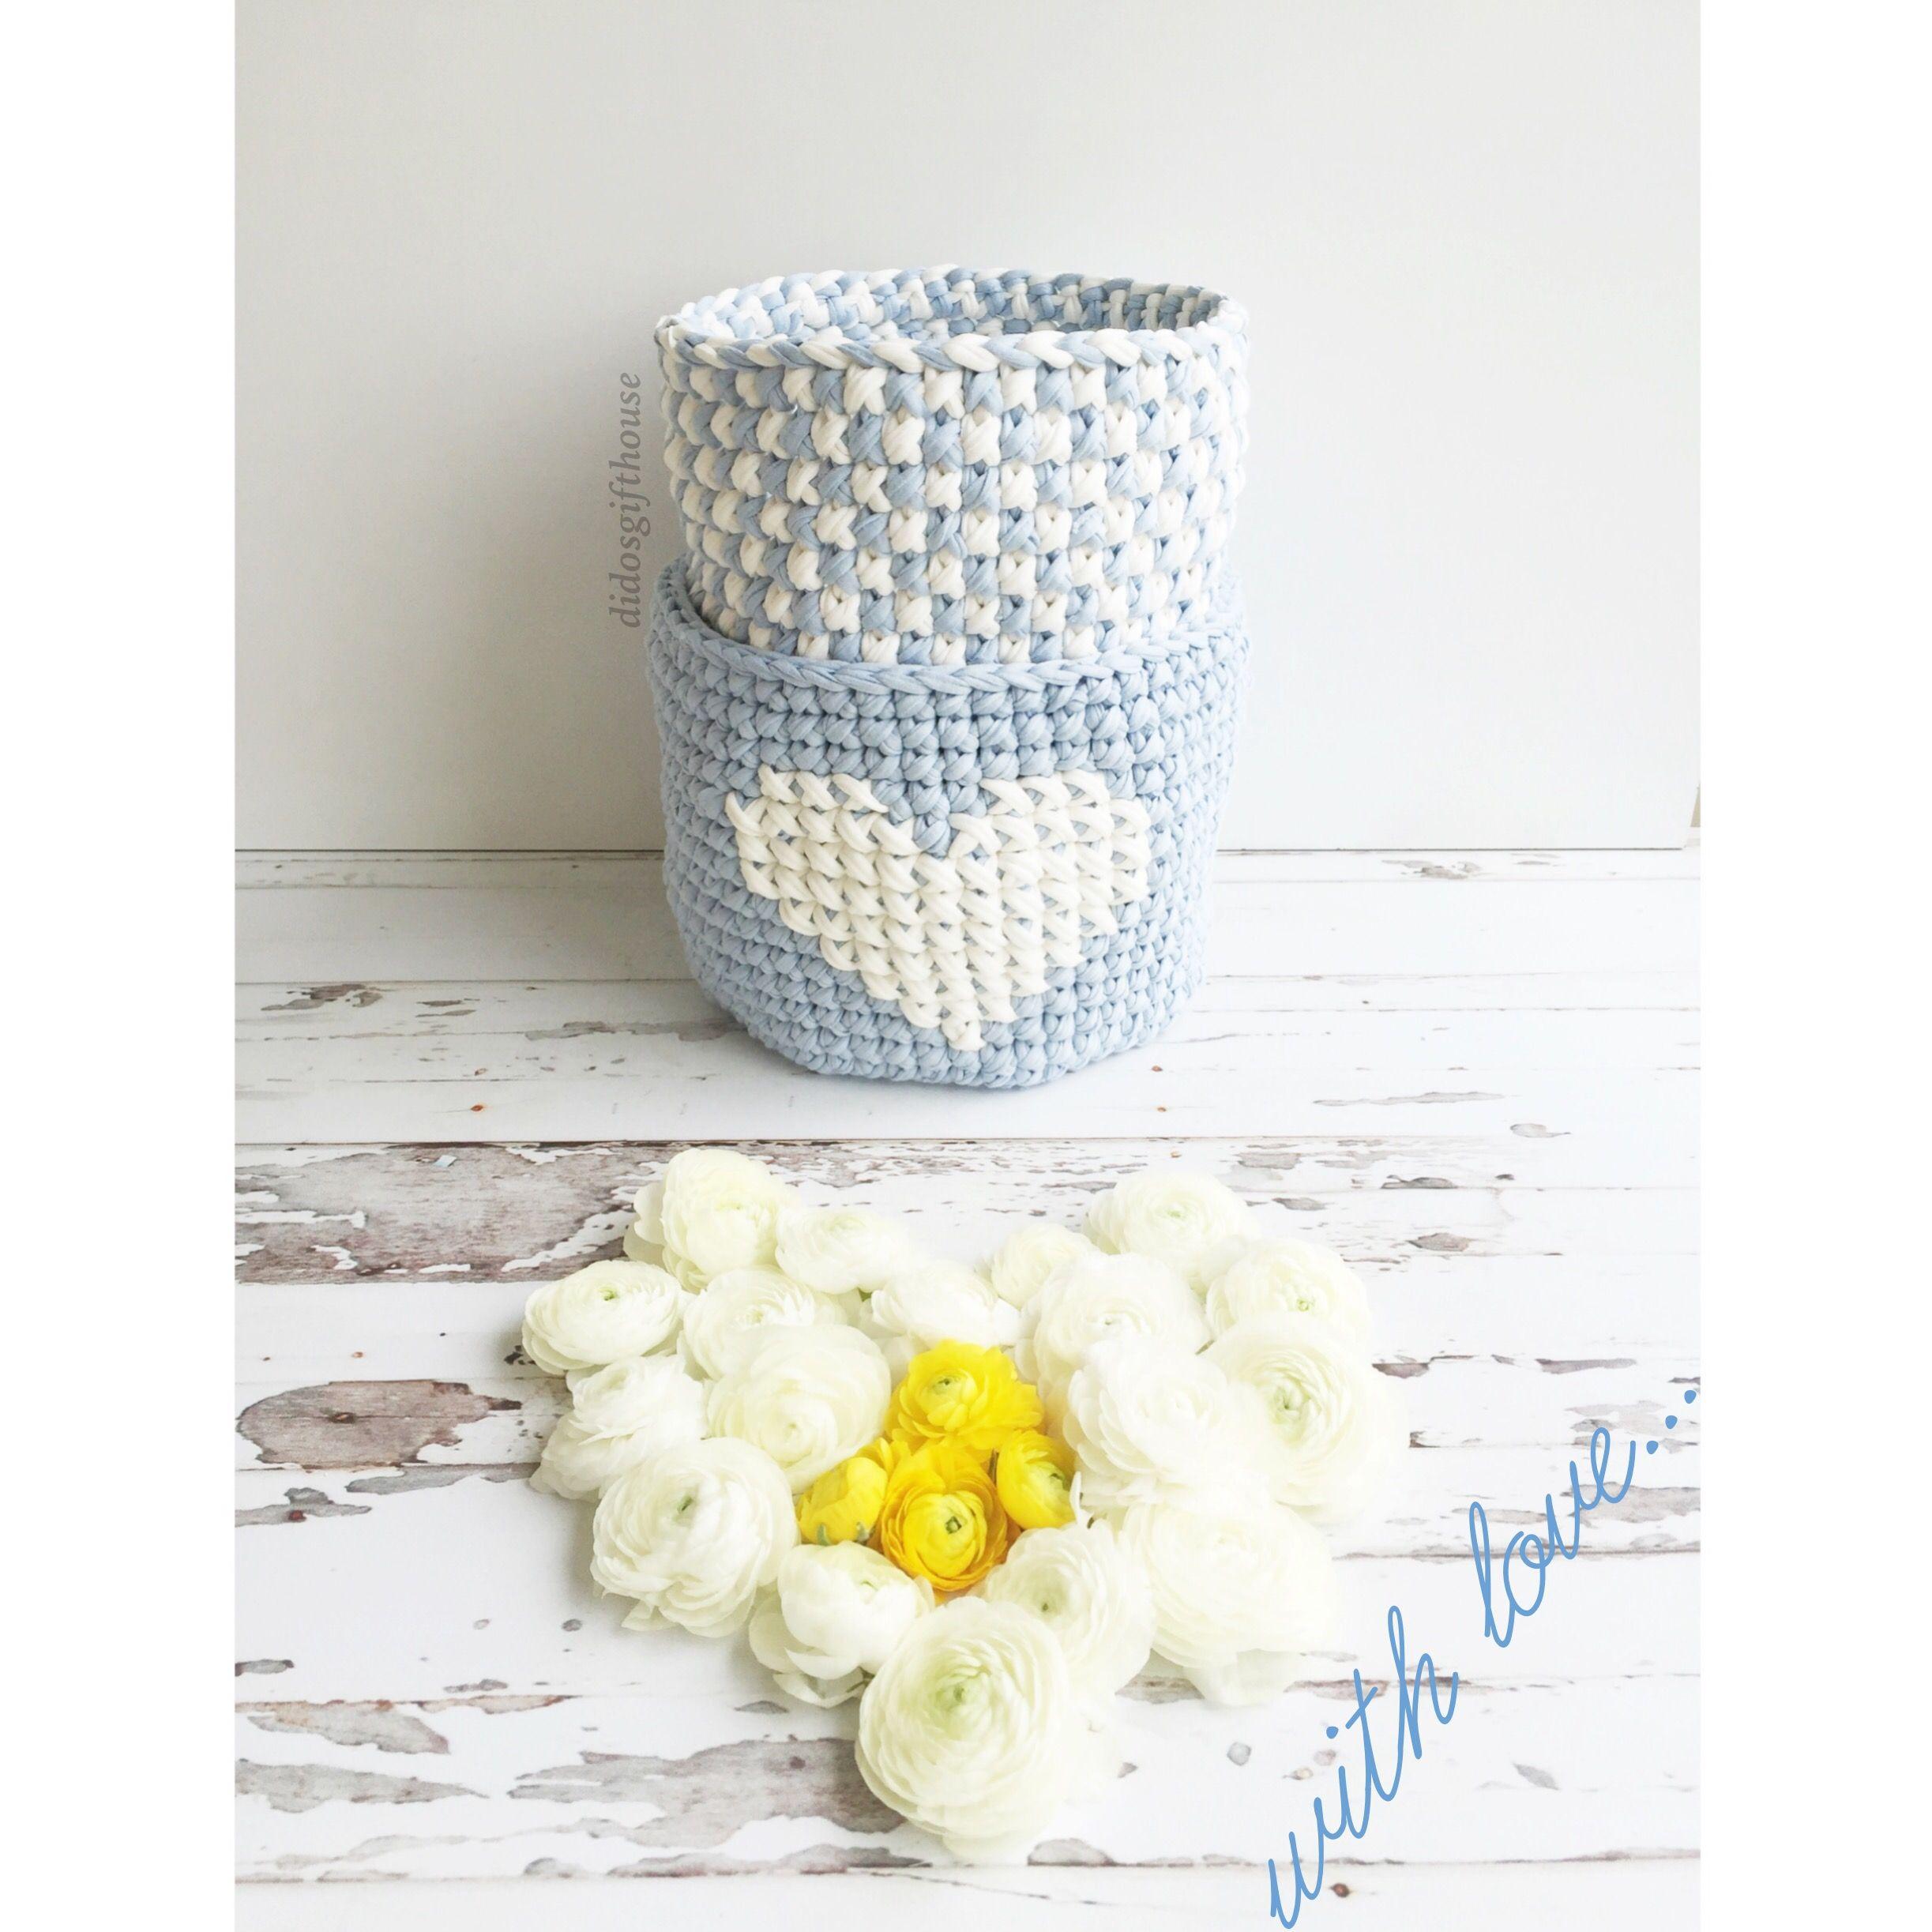 instagram didos gifthouse | orgu | Pinterest | Amigurumi and Crochet